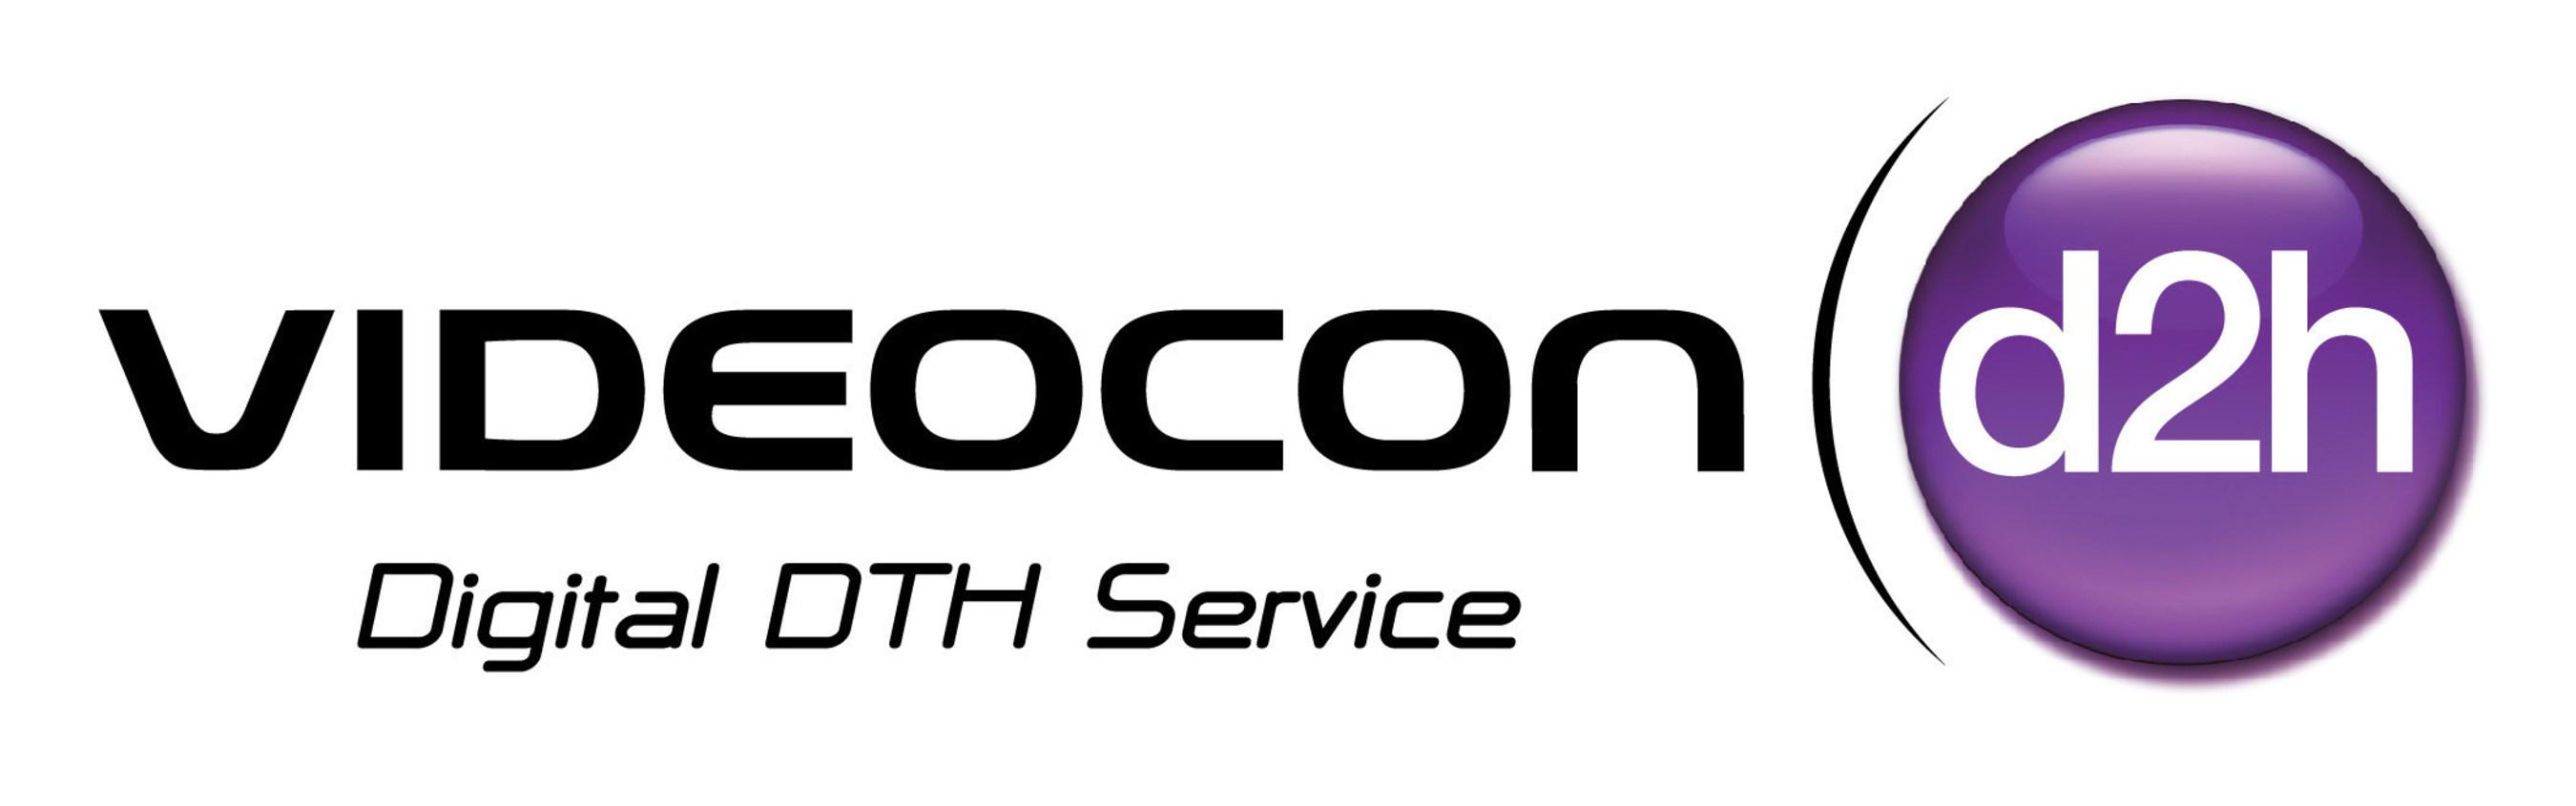 Videocon d2h Logo